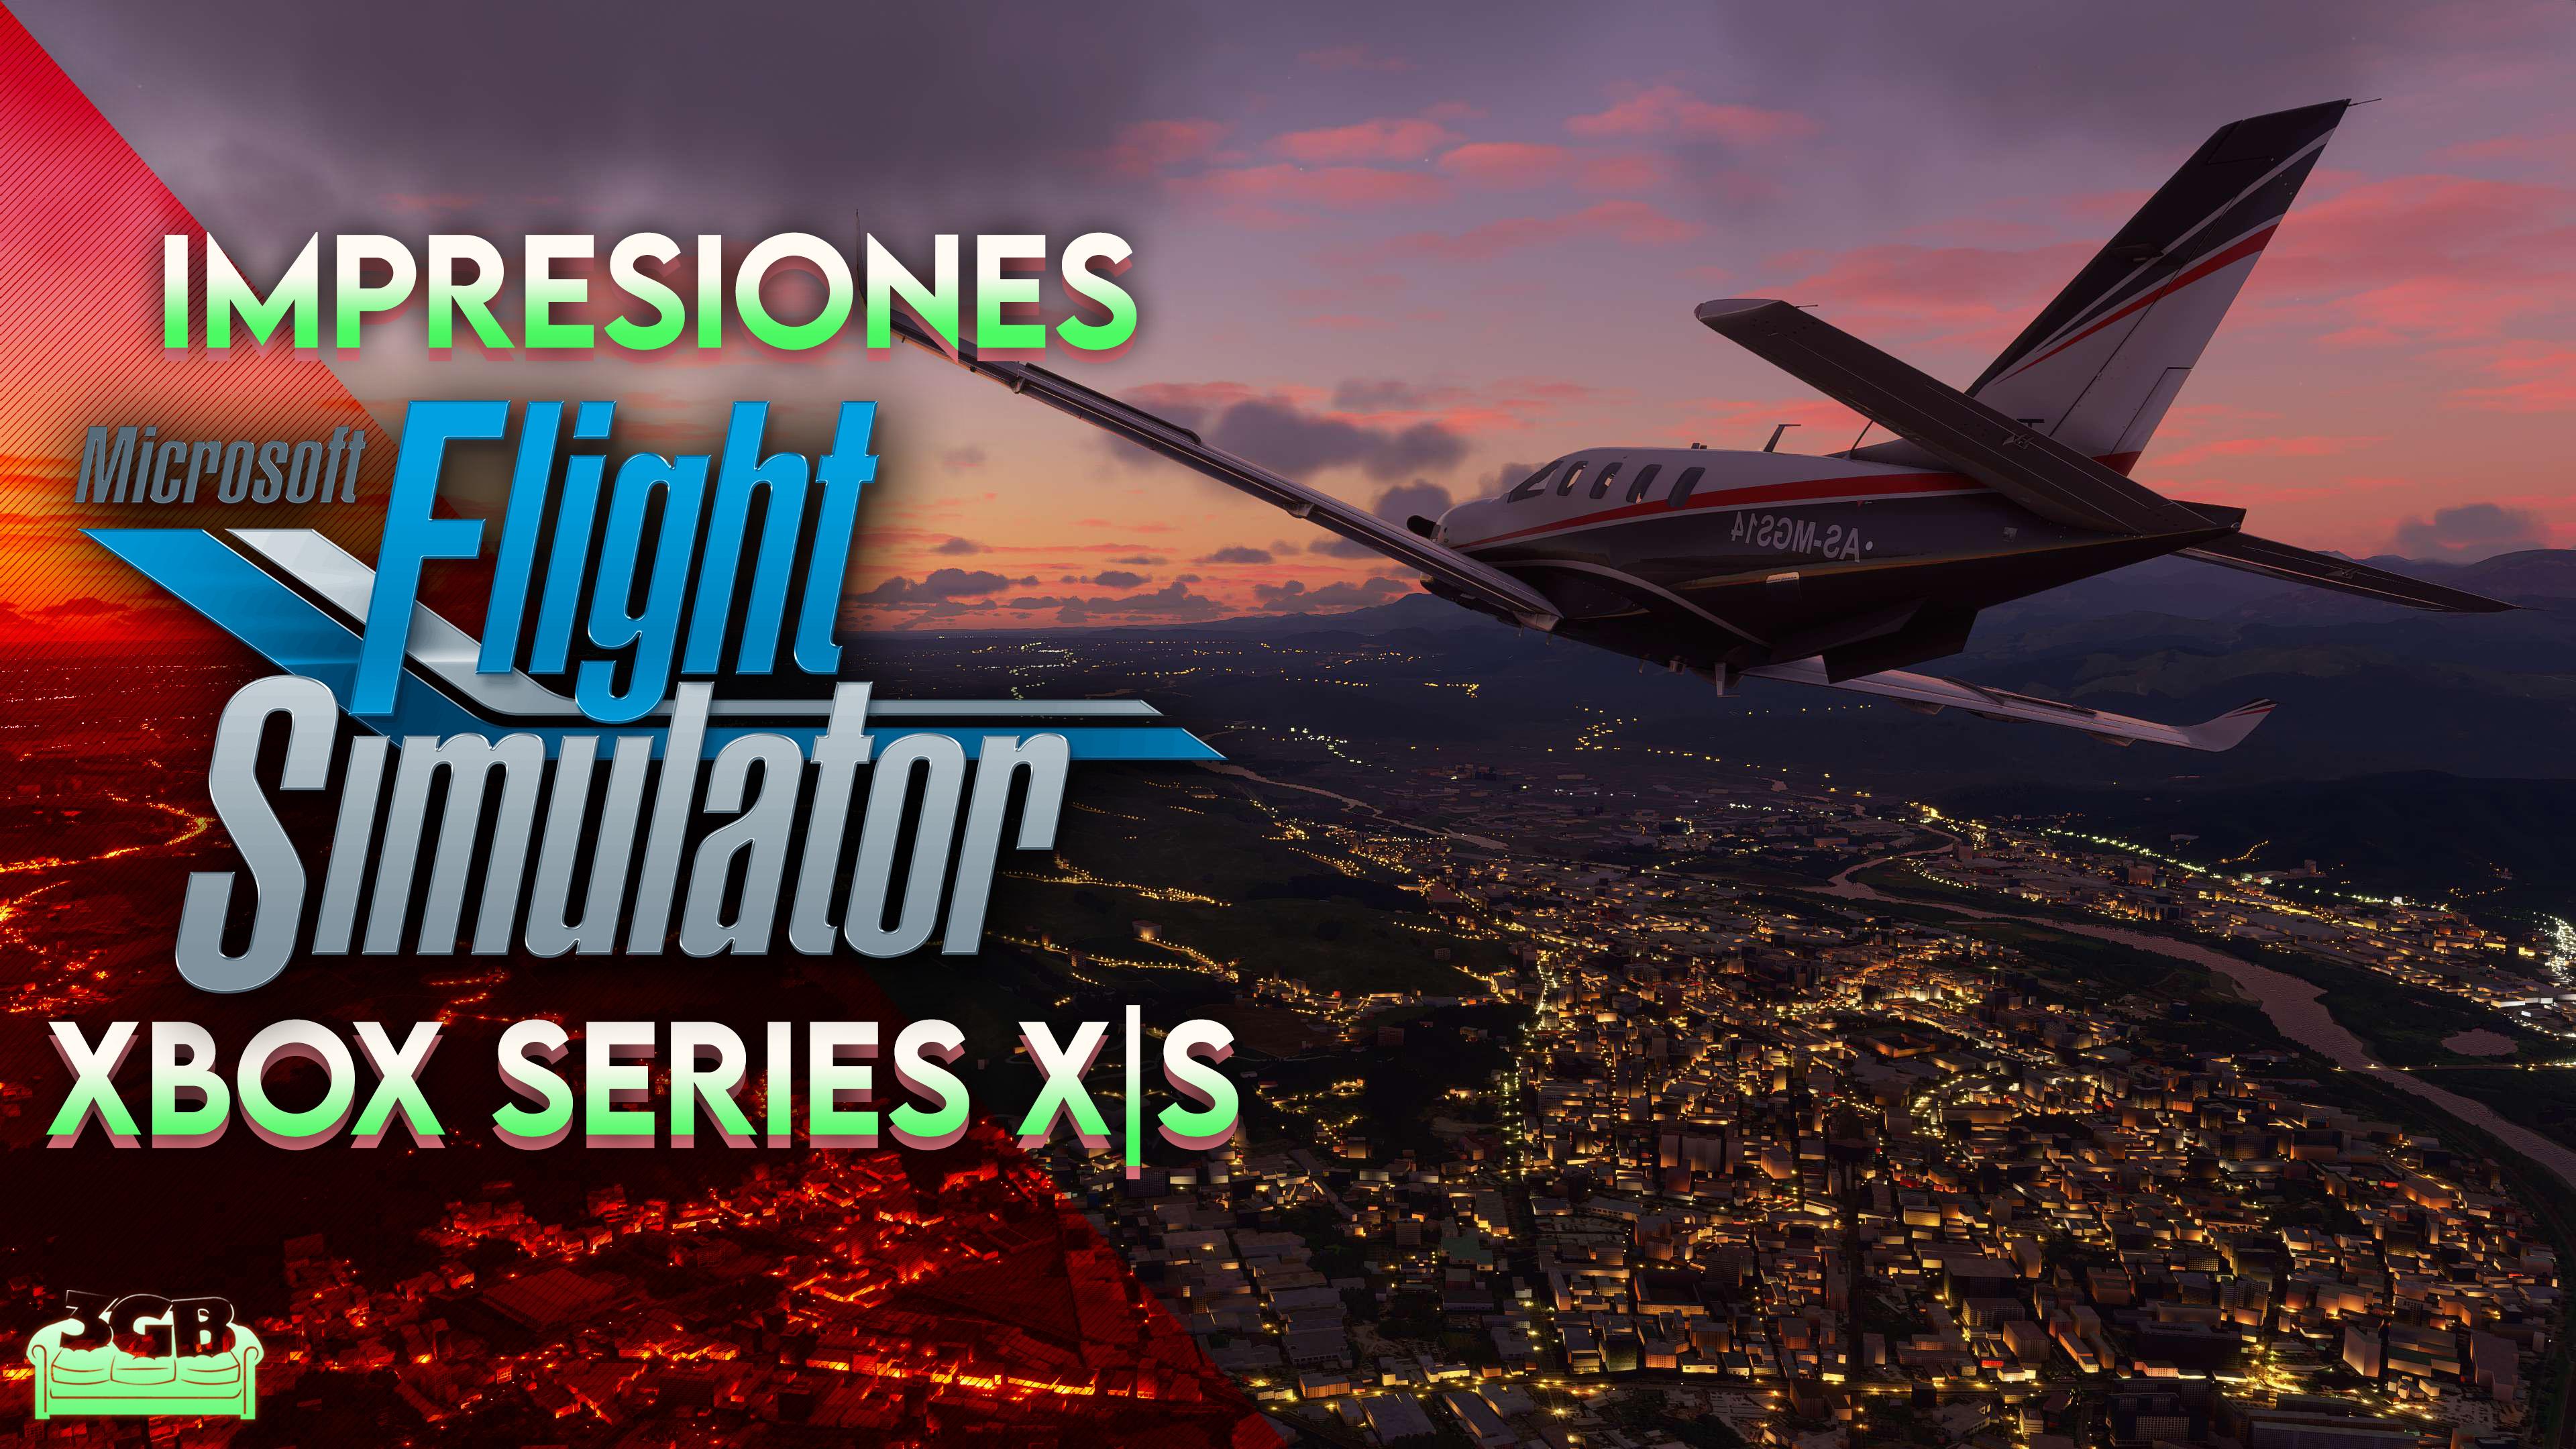 Impresiones Microsoft Flight Simulator en Xbox Series X|S